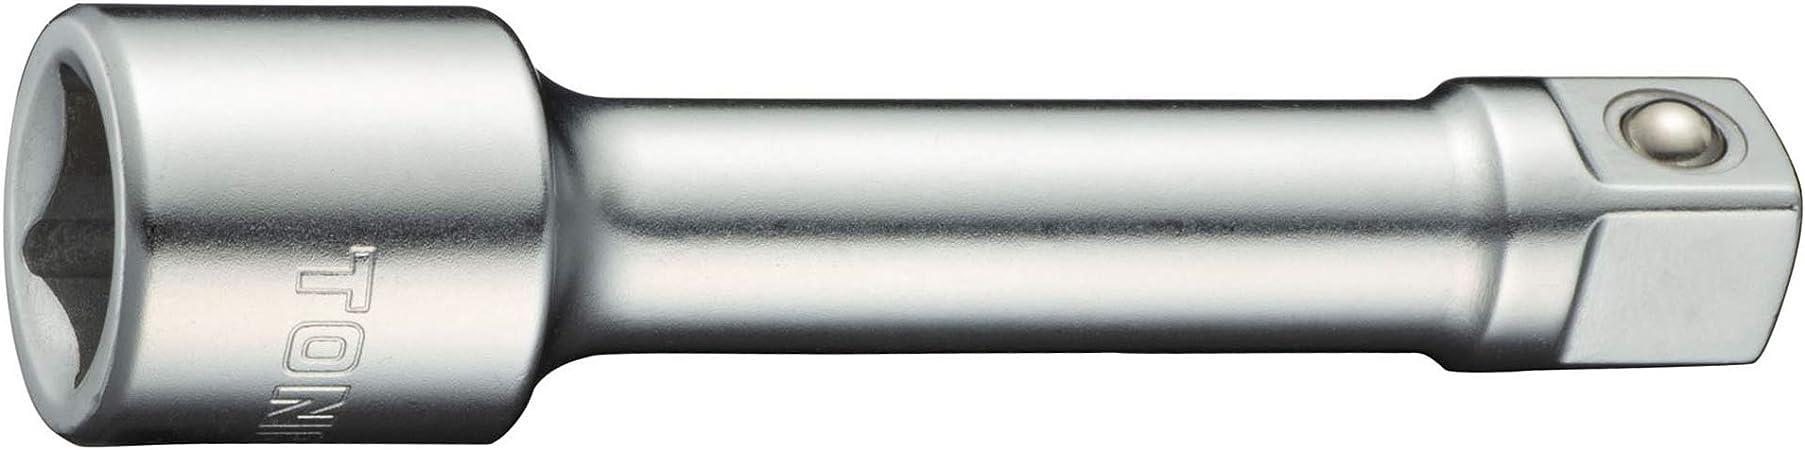 Kipp 06461-2A32X25 Zinc Adjustable Handle with 5//16-18 External Thread Orange Powder-Coated Finish Modern Design Style Stainless Steel Components K0123.2A32X25 25 mm Screw Length KIPP Inc Size 2 Inch